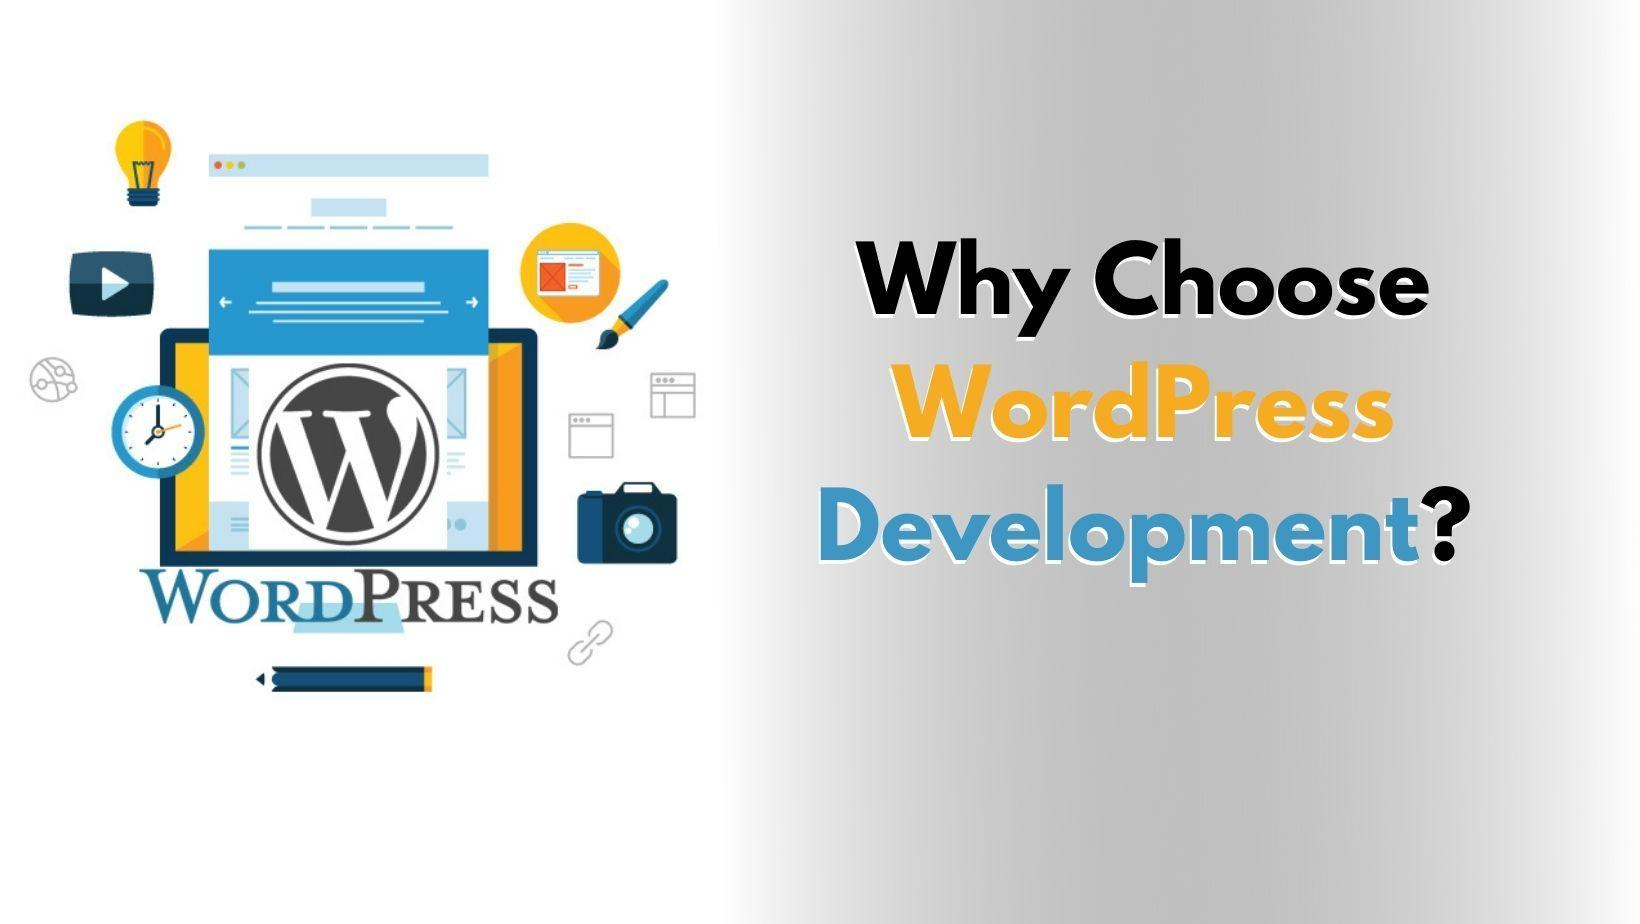 Why Choose WordPress Development?